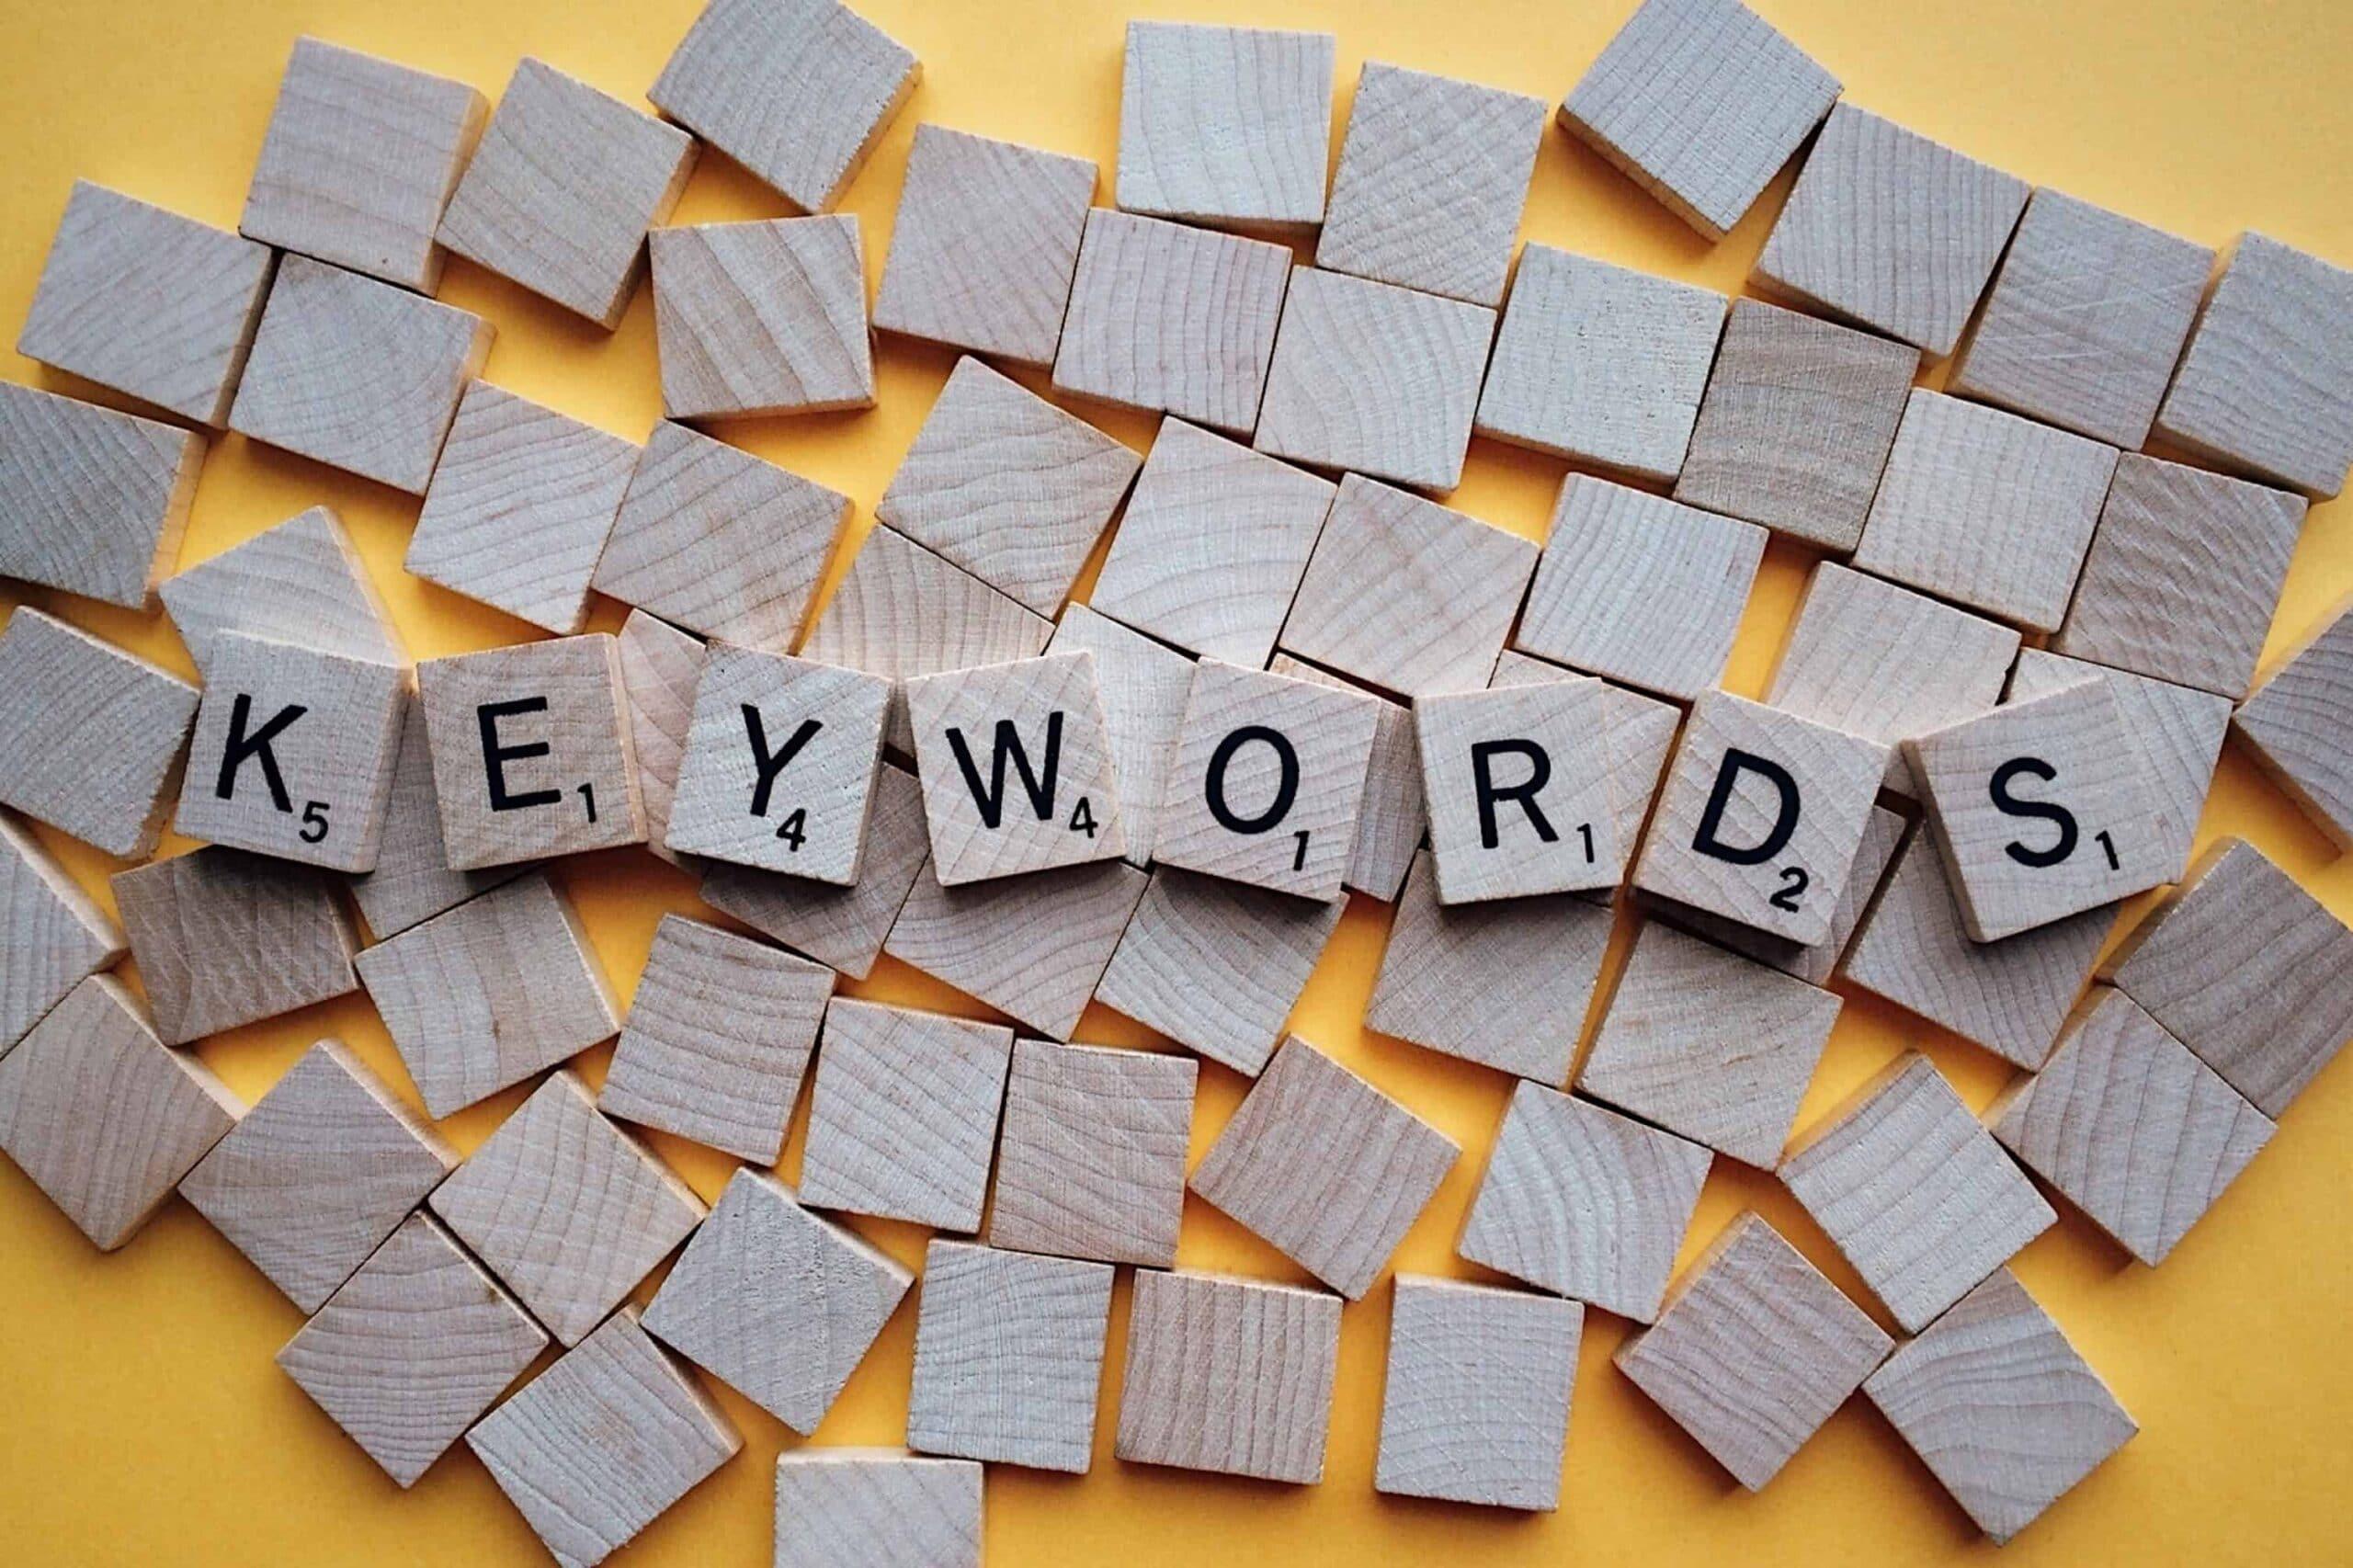 canibalizarea cuvintelor cheie